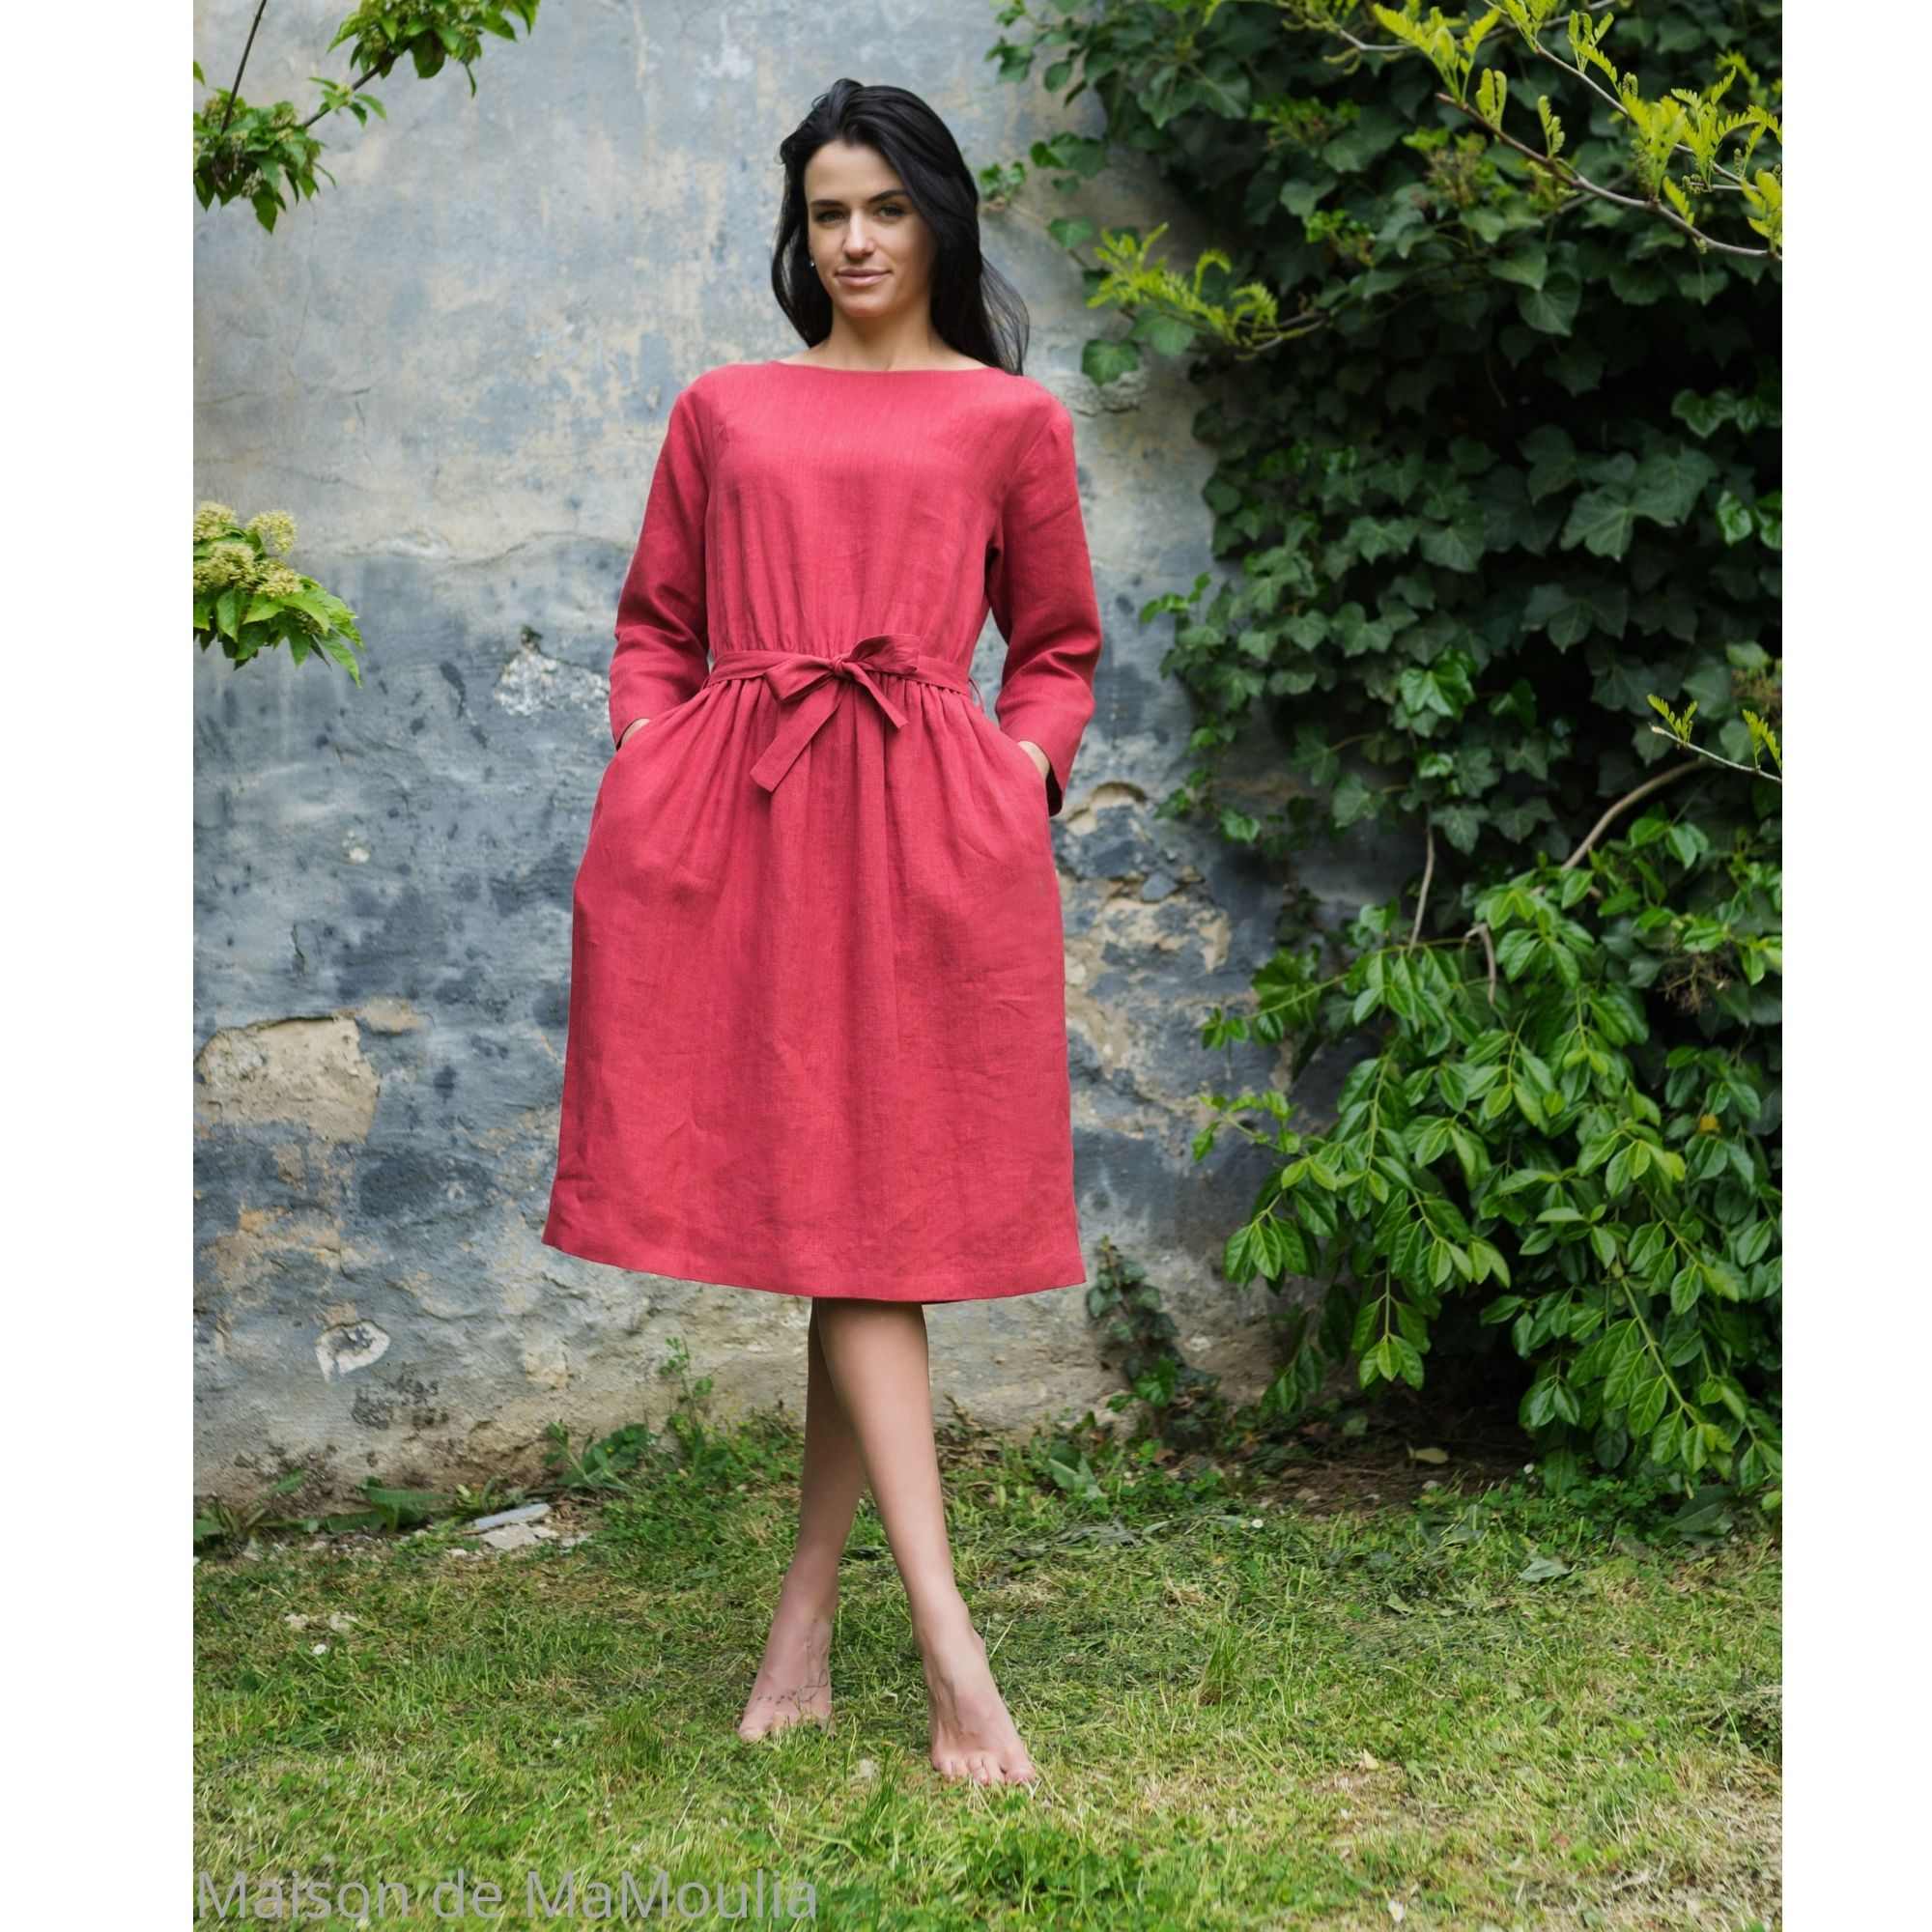 OFFON - Robe midi avec ceinture - 100% lin lavé - rose framboise